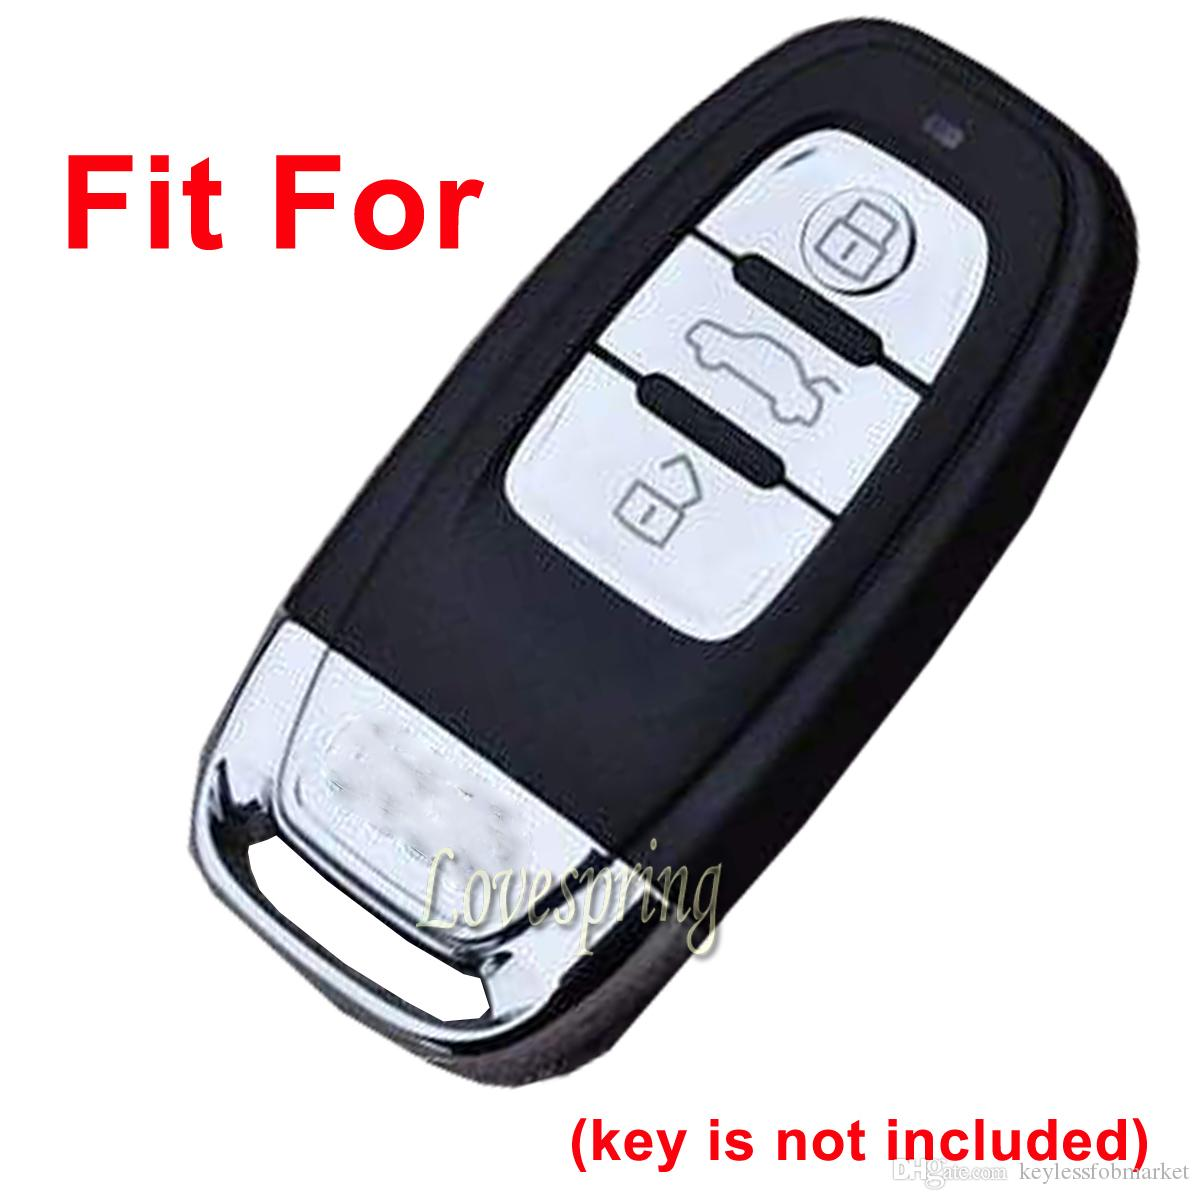 3 Tasten Auto Key Fob Remote Cover Key Fall Haut Halter Protector Shell Keyless Für Audi A1 A3 A4 A5 A6 A7 A7 A8 Q5 Q7 R8